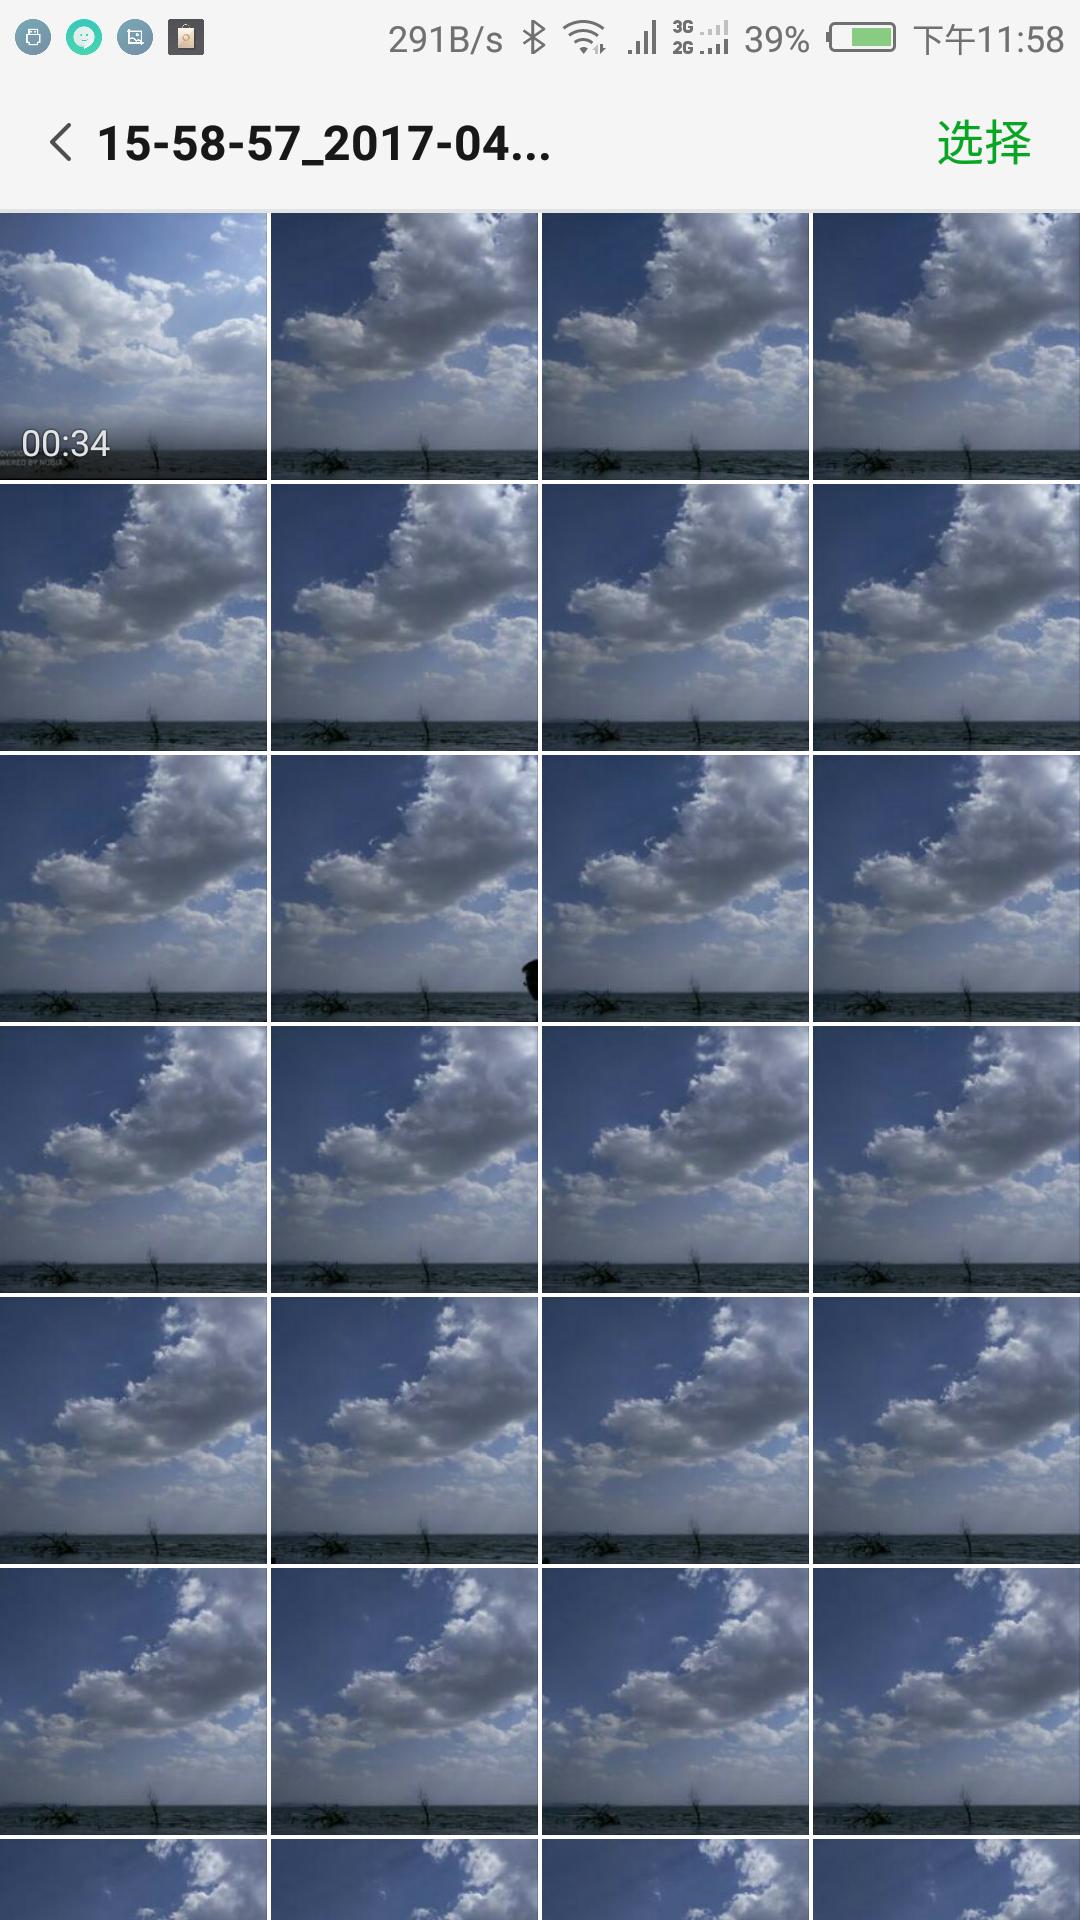 Screenshot_2017-05-07-23-58-33.png